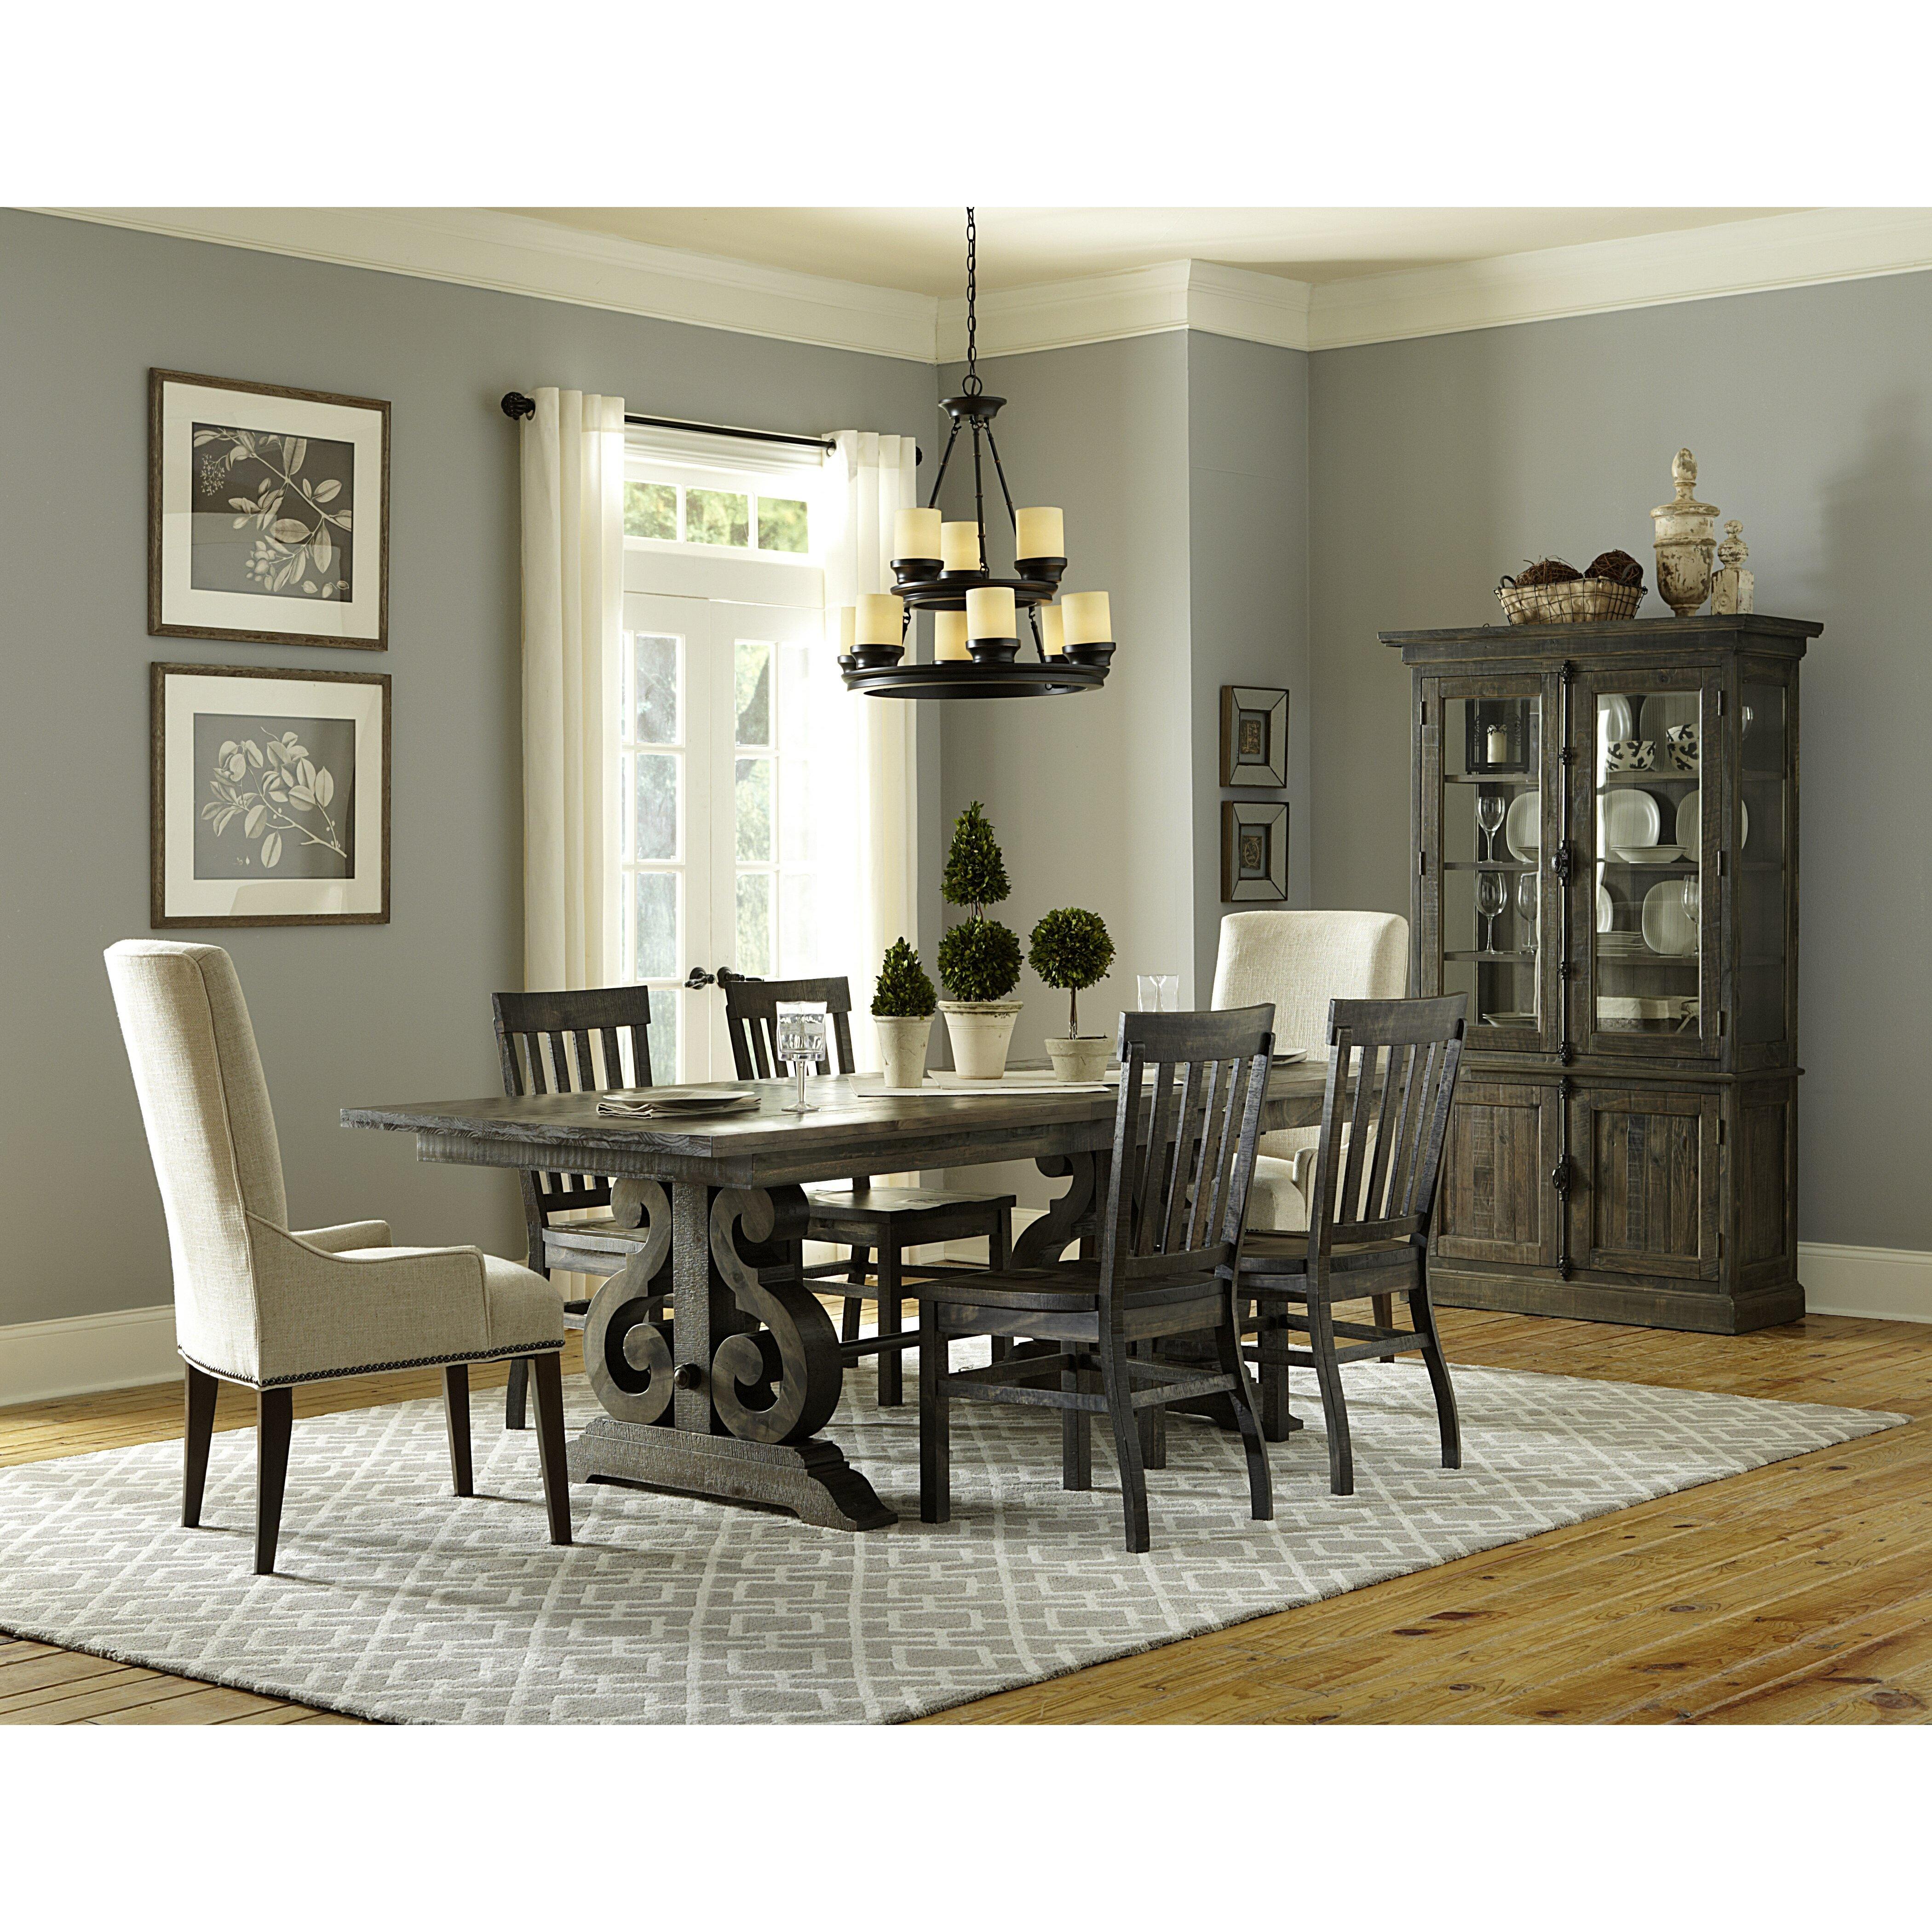 Magnussen bellamy china cabinet reviews wayfair - Magnussen dining room furniture ideas ...